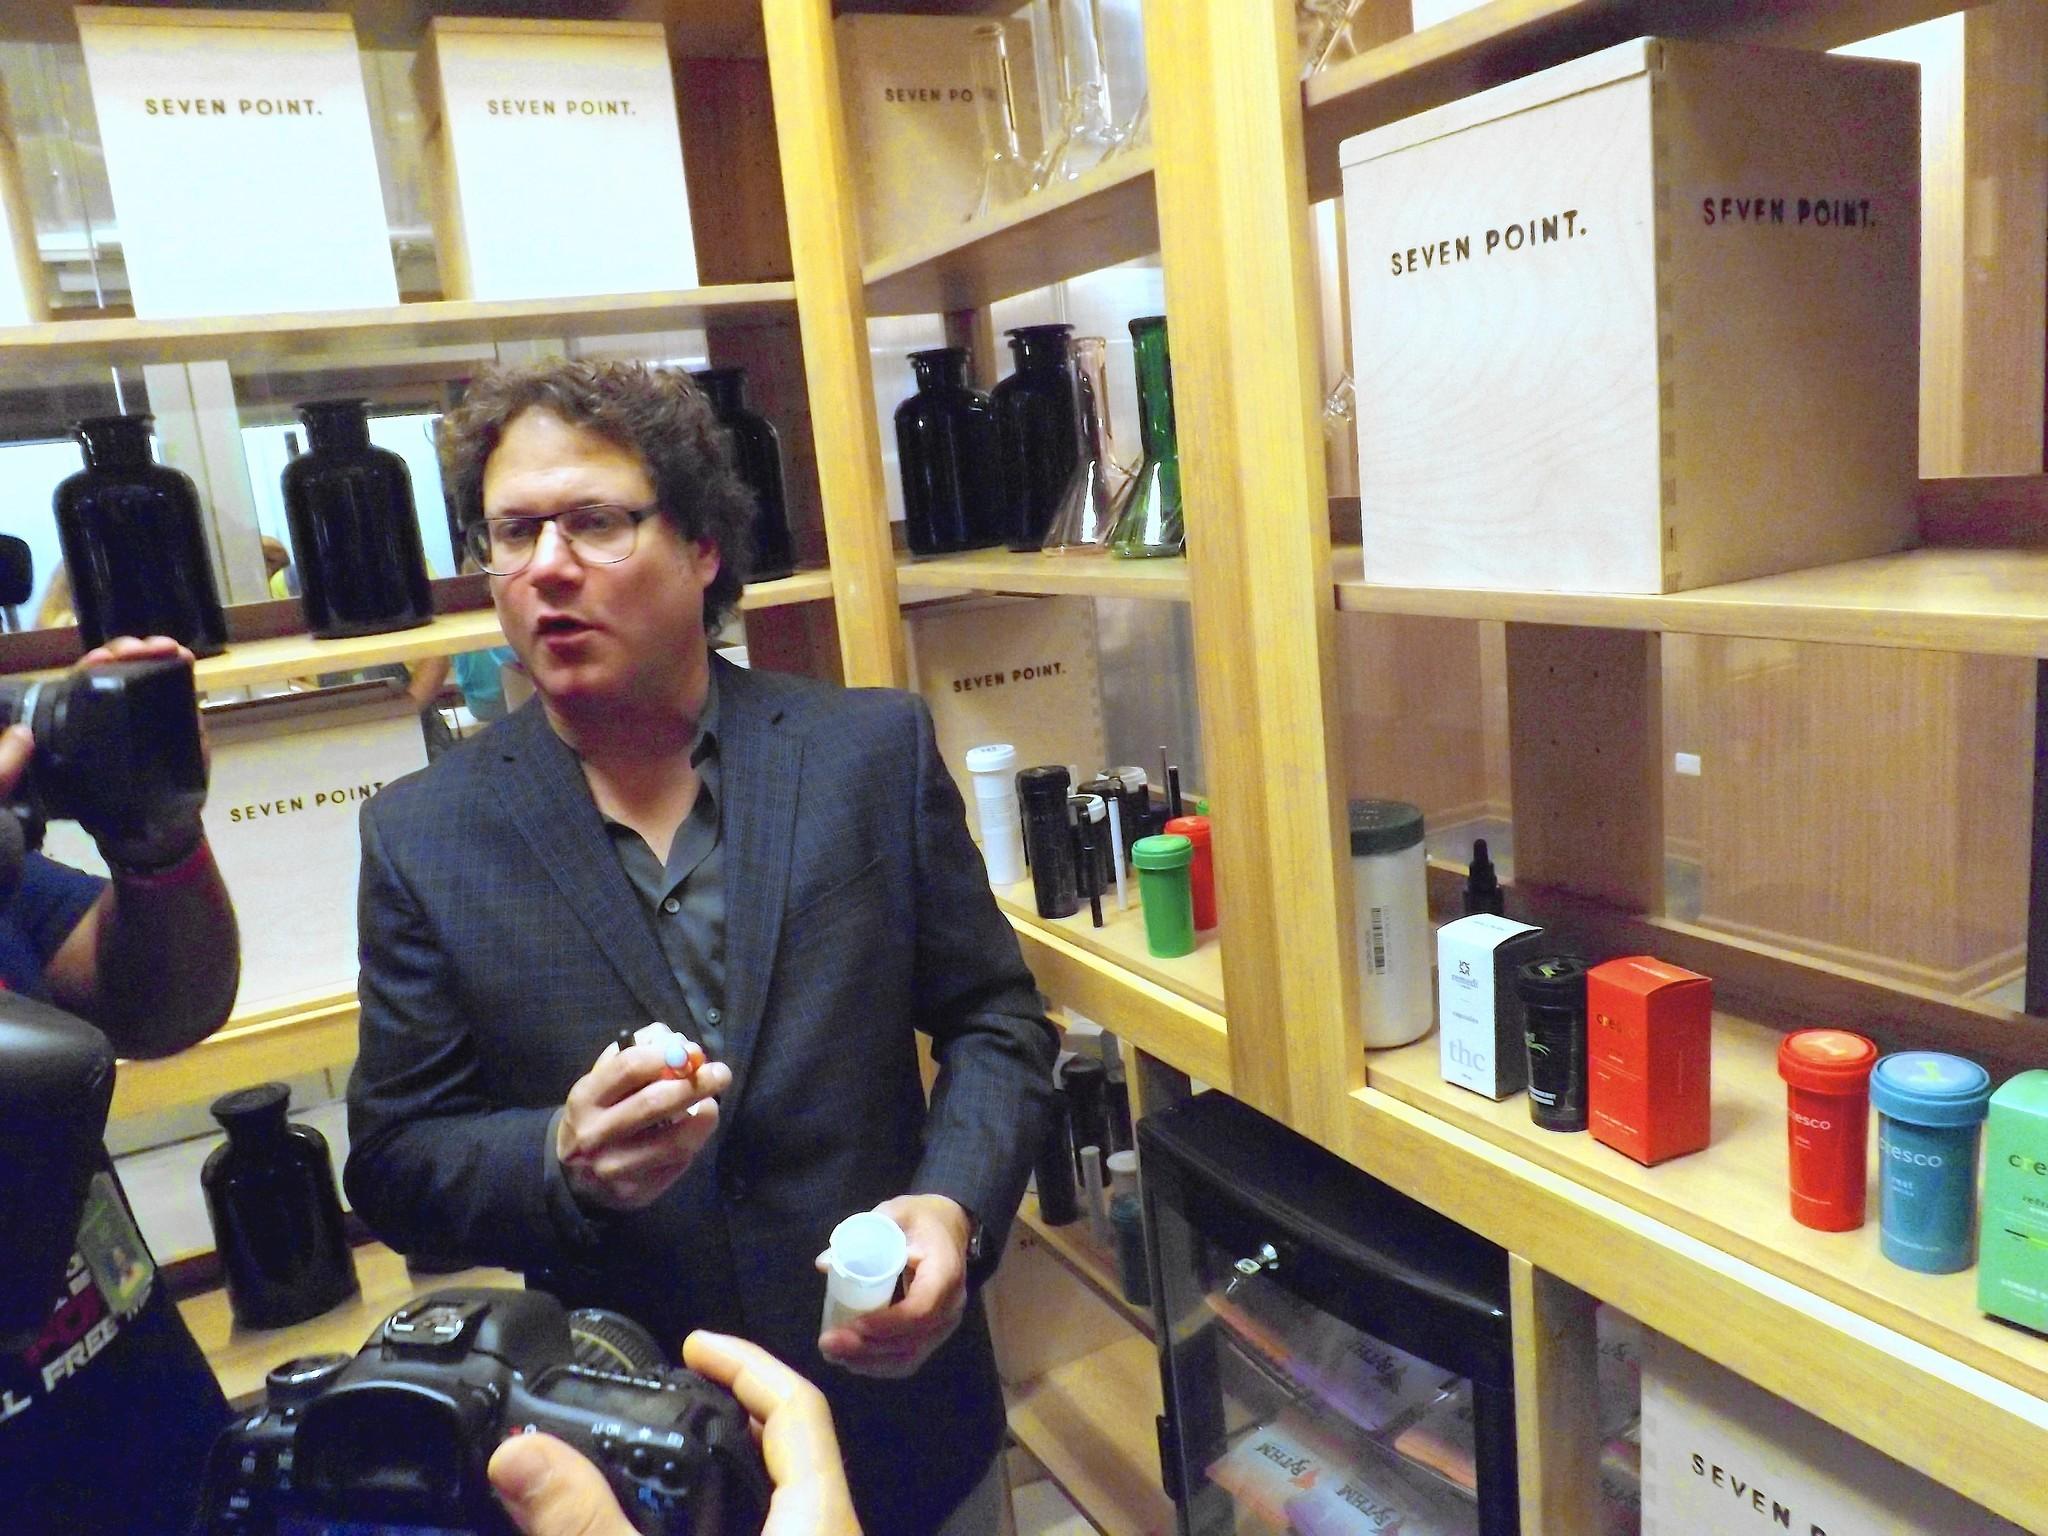 Medical marijuana dispensary opens in downtown Oak Park